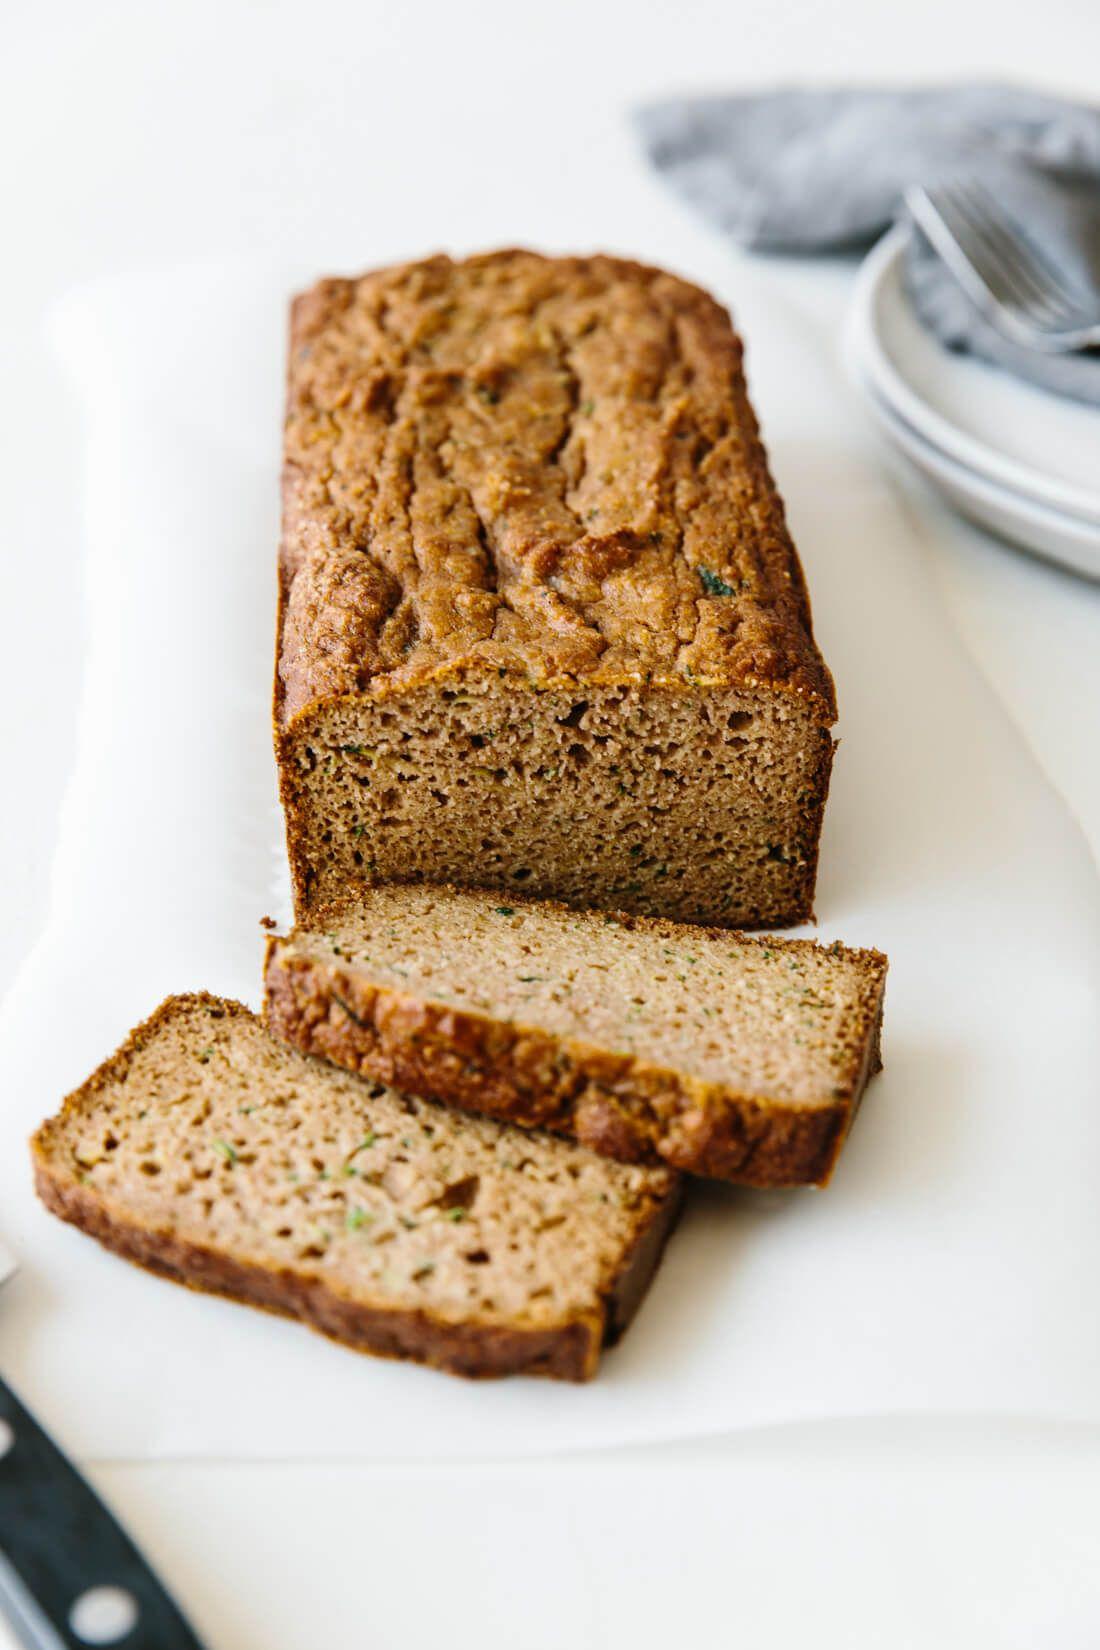 This Super Moist Paleo Zucchini Bread Recipe Is Made With Almond Flour Tapioca Flour And Coconut Flour It S Paleo Zucchini Bread Paleo Baking Paleo Zucchini